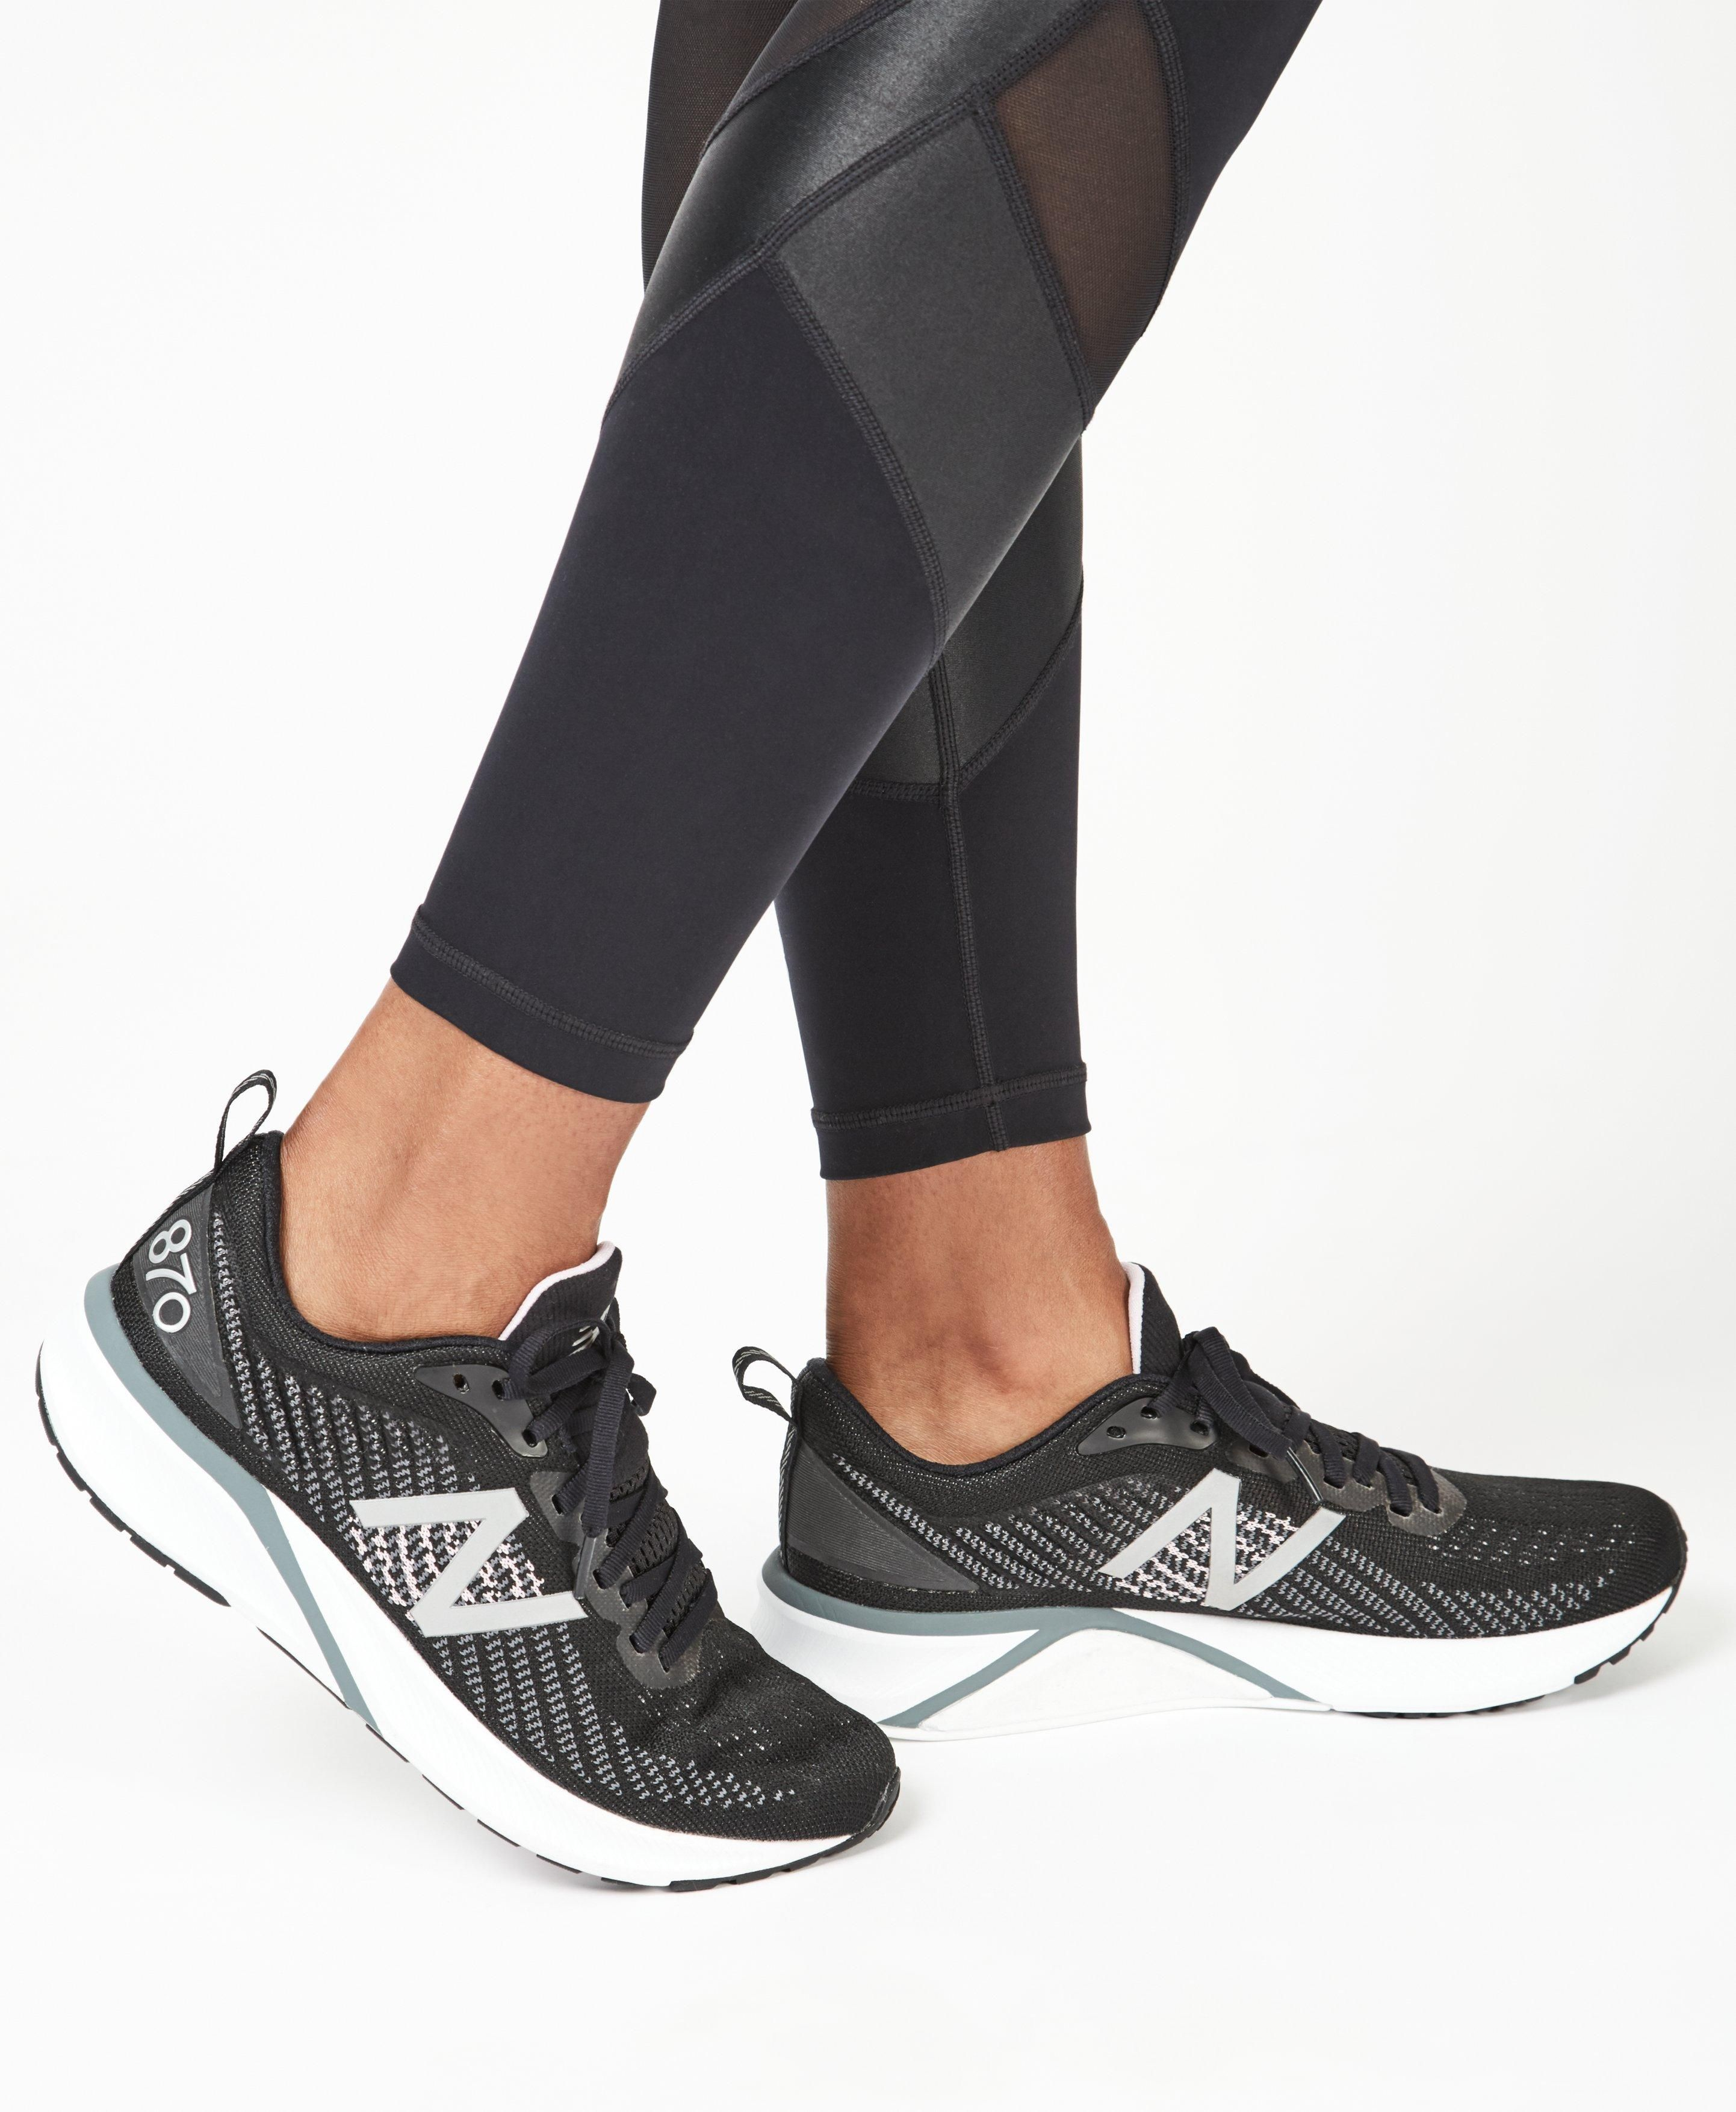 870 New Balance Running Trainer in 2020